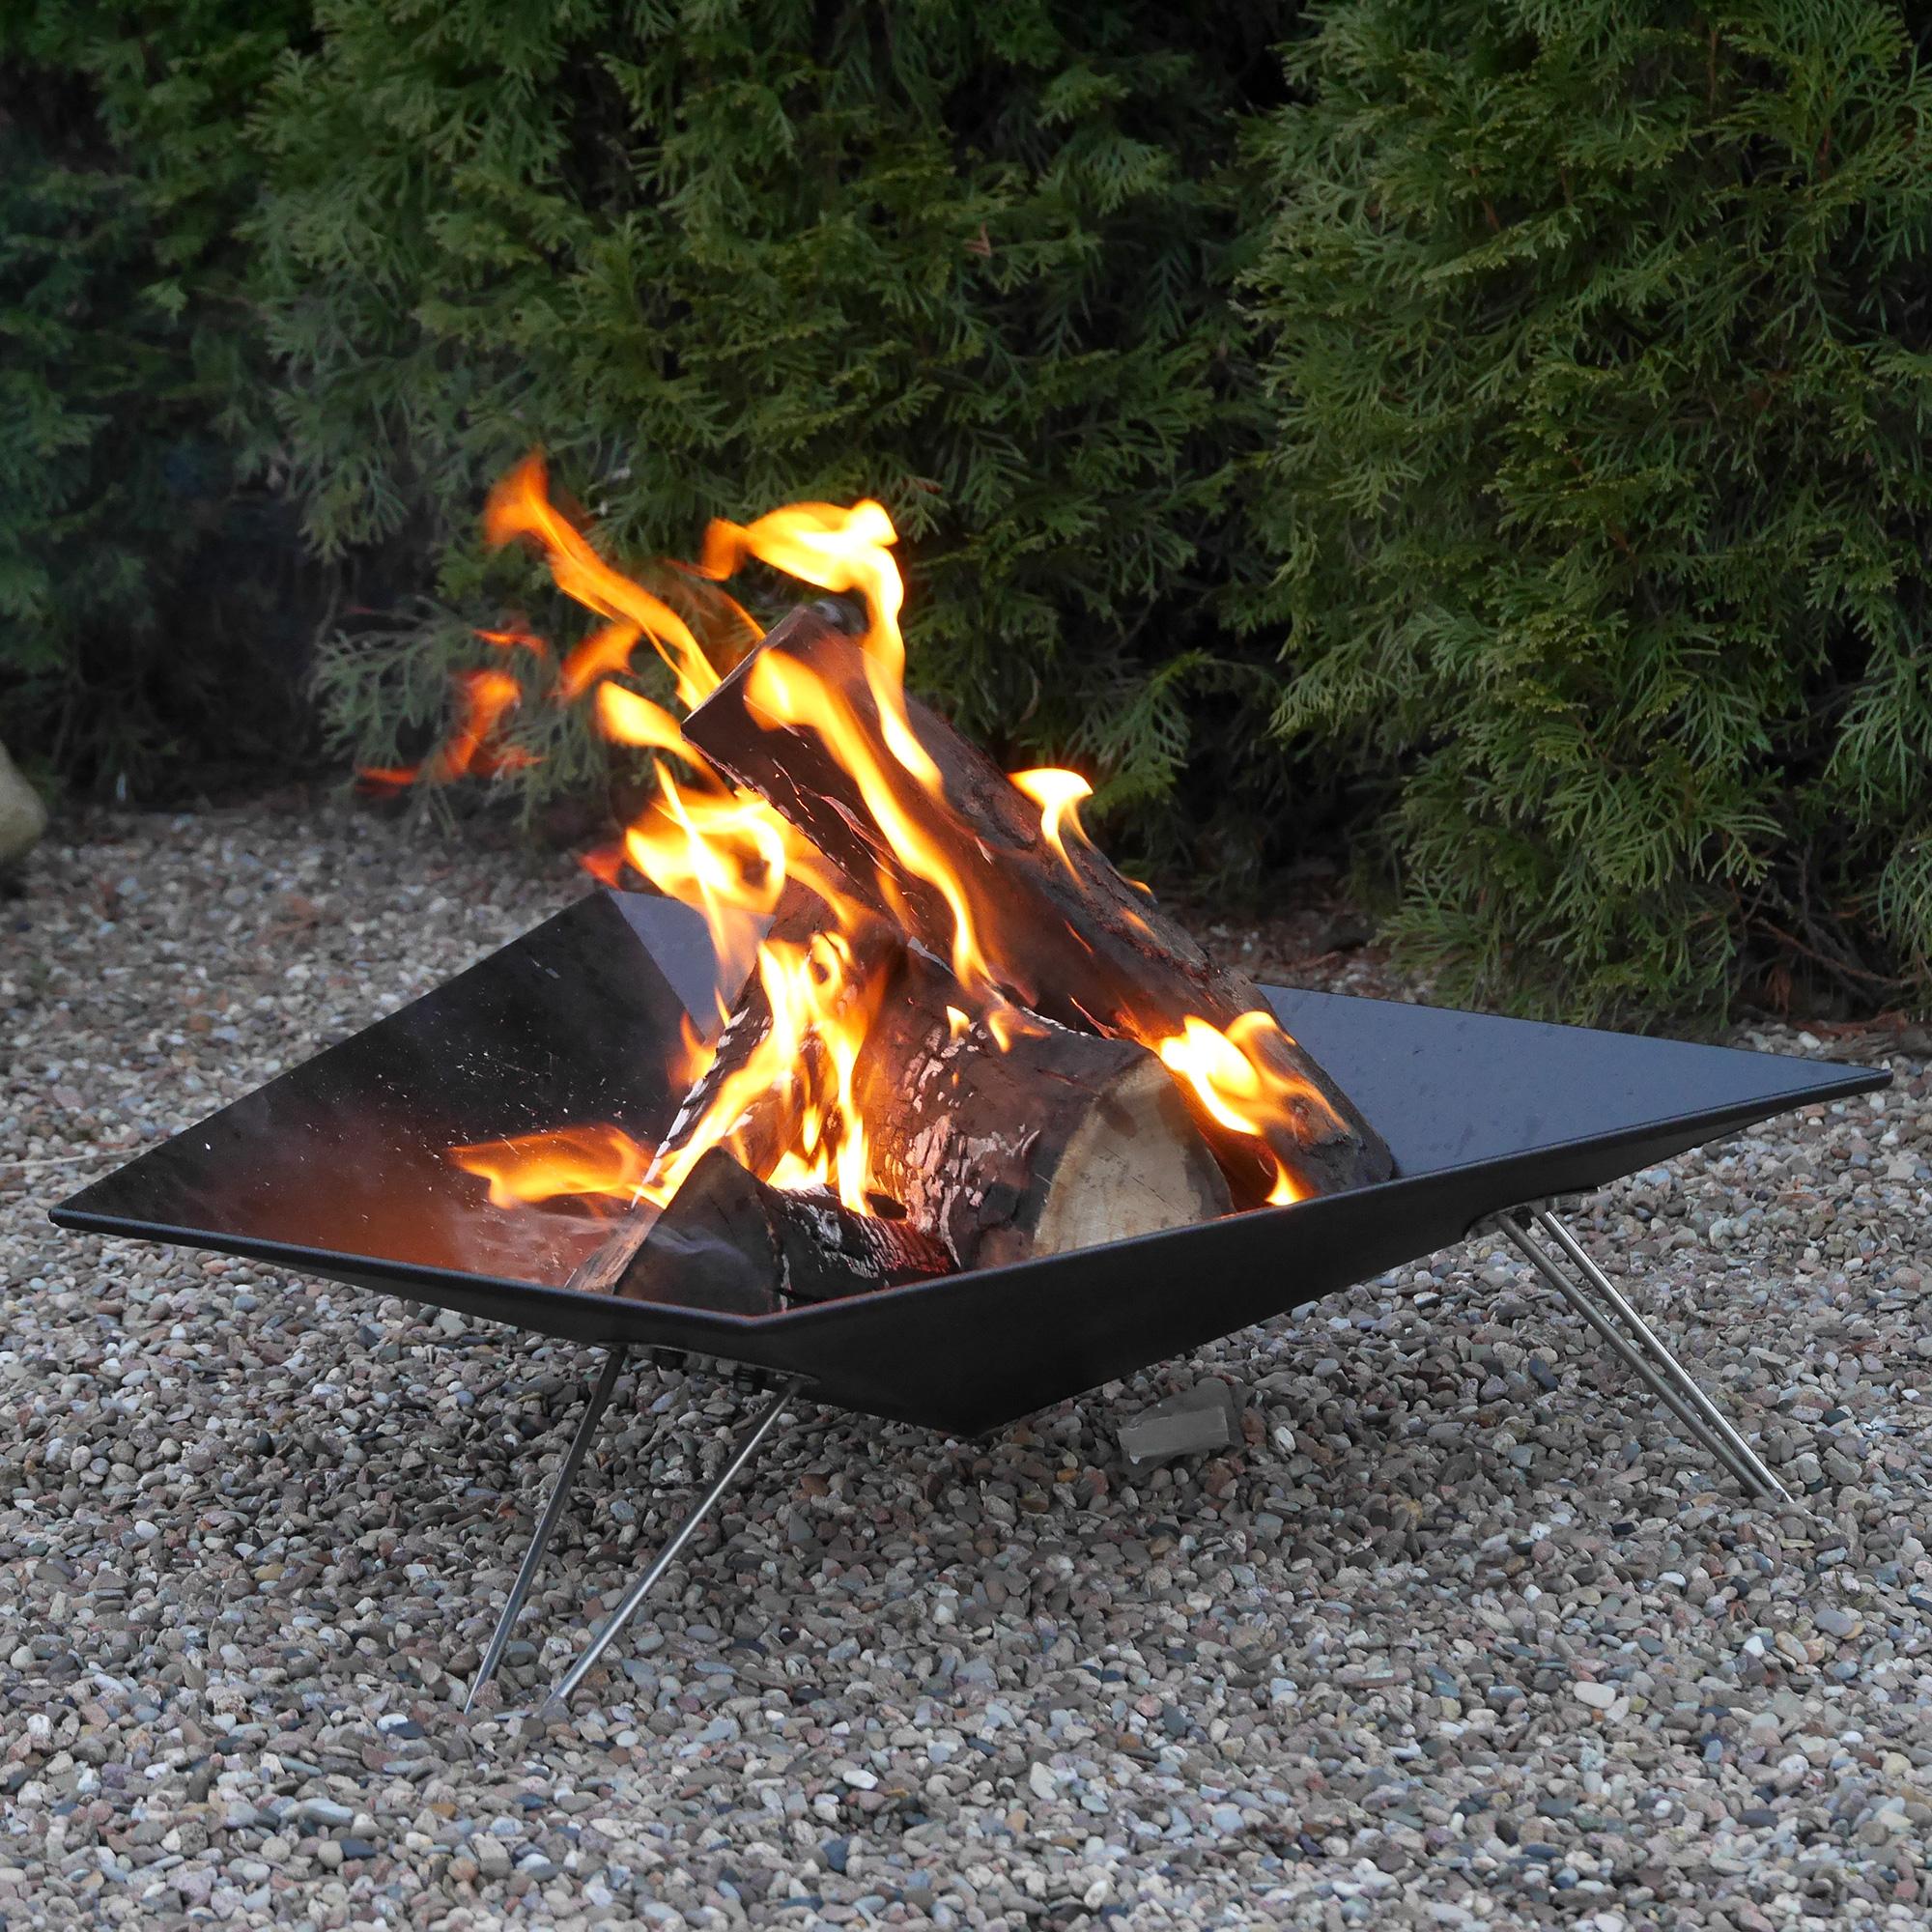 Fire-bowls-garden-deck-campfire-designer-fire-dish-VASNER-Merive-M3